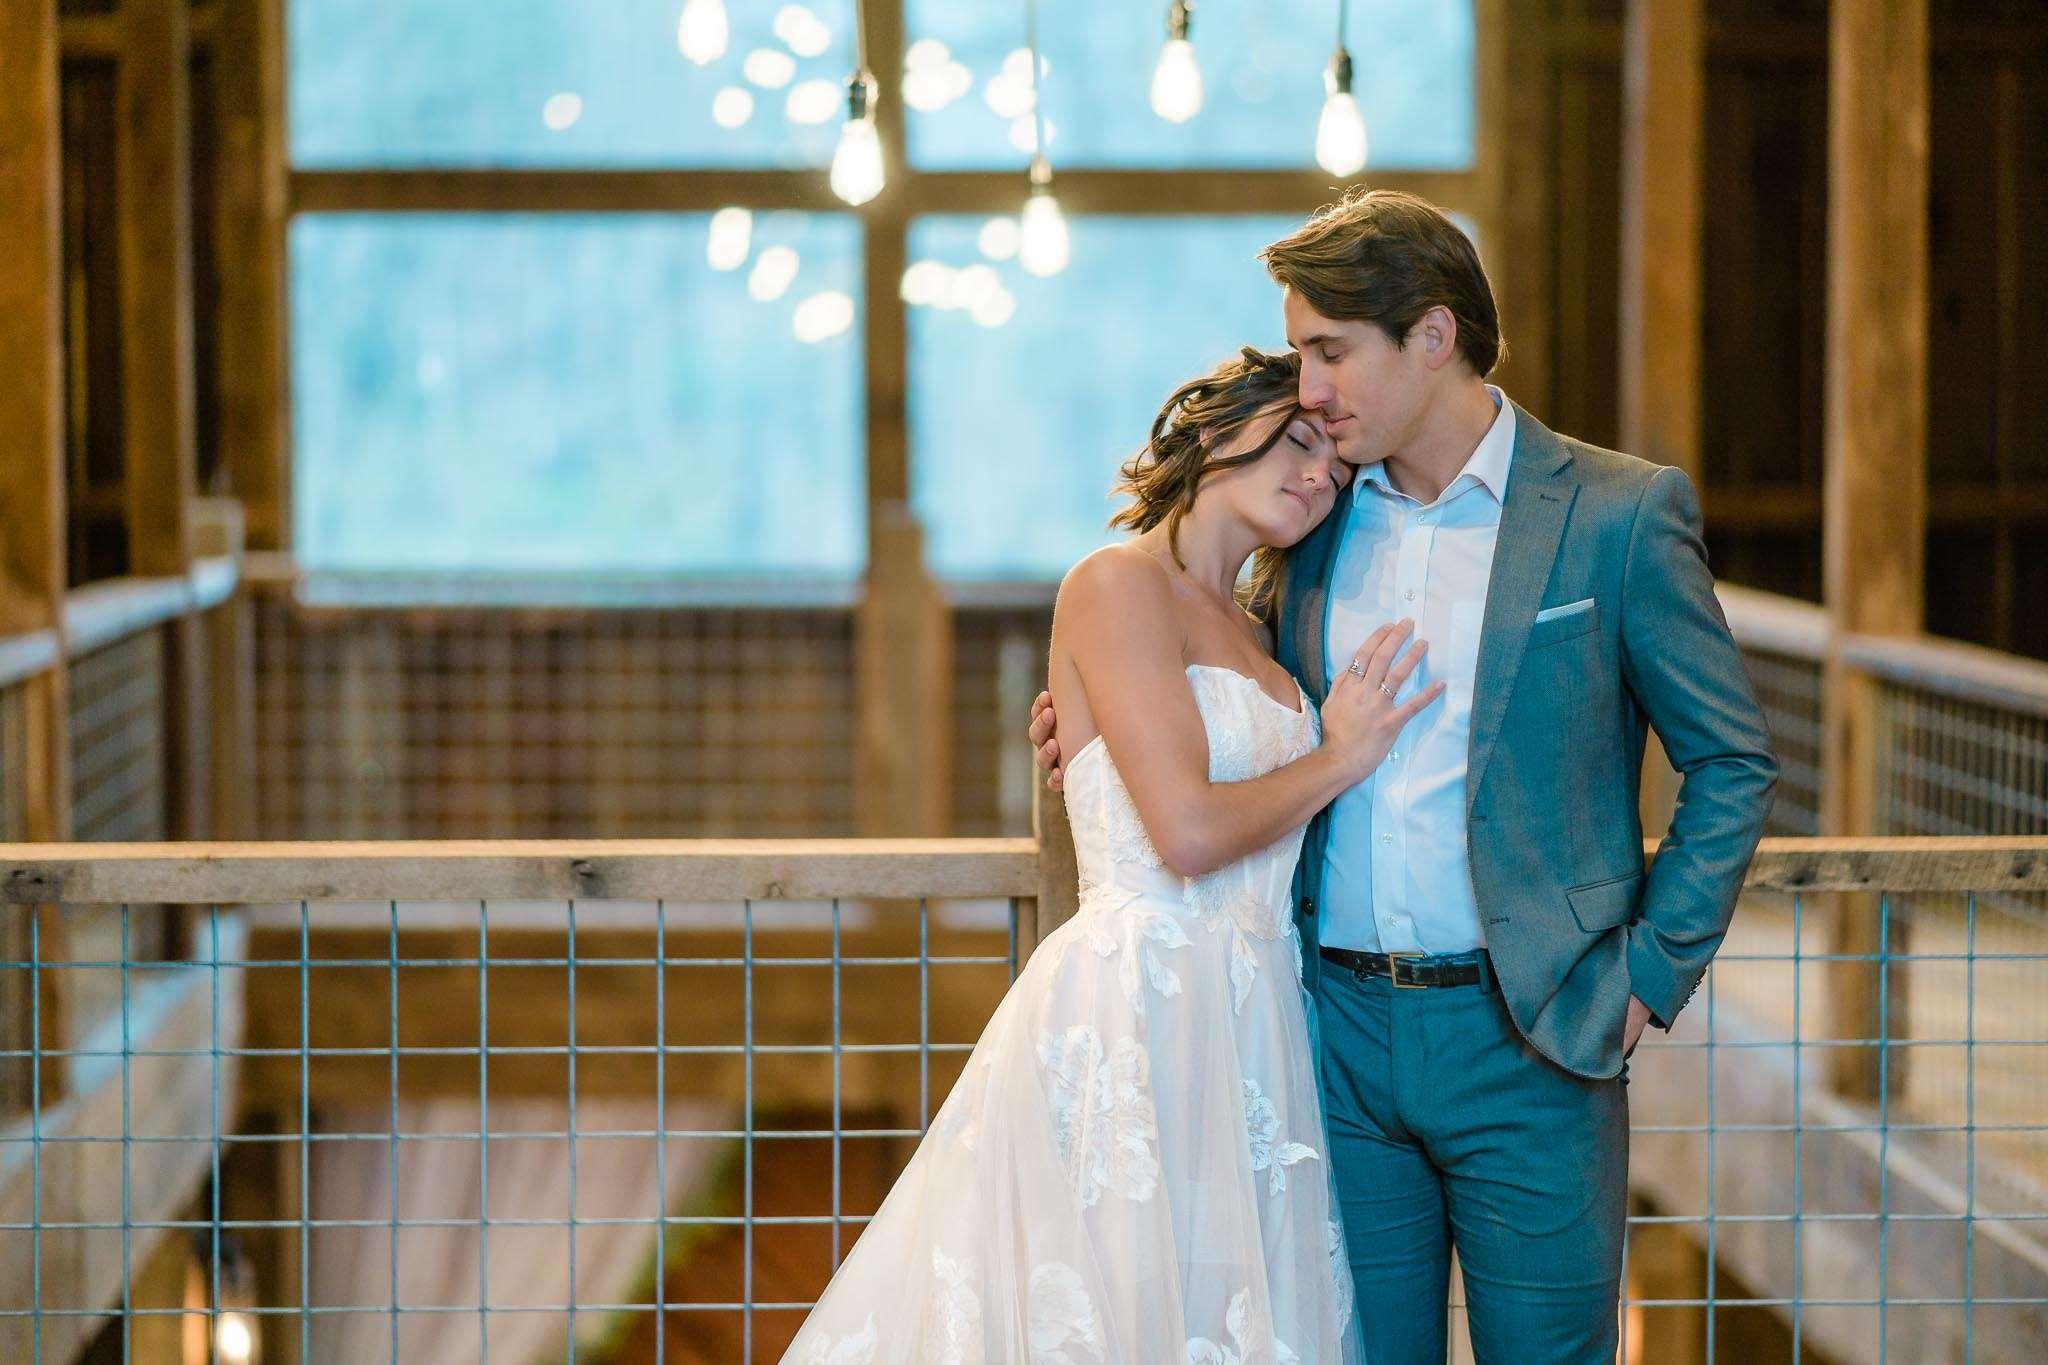 Evansville, IN Wedding Photographer - Keepsake Wedding Photography